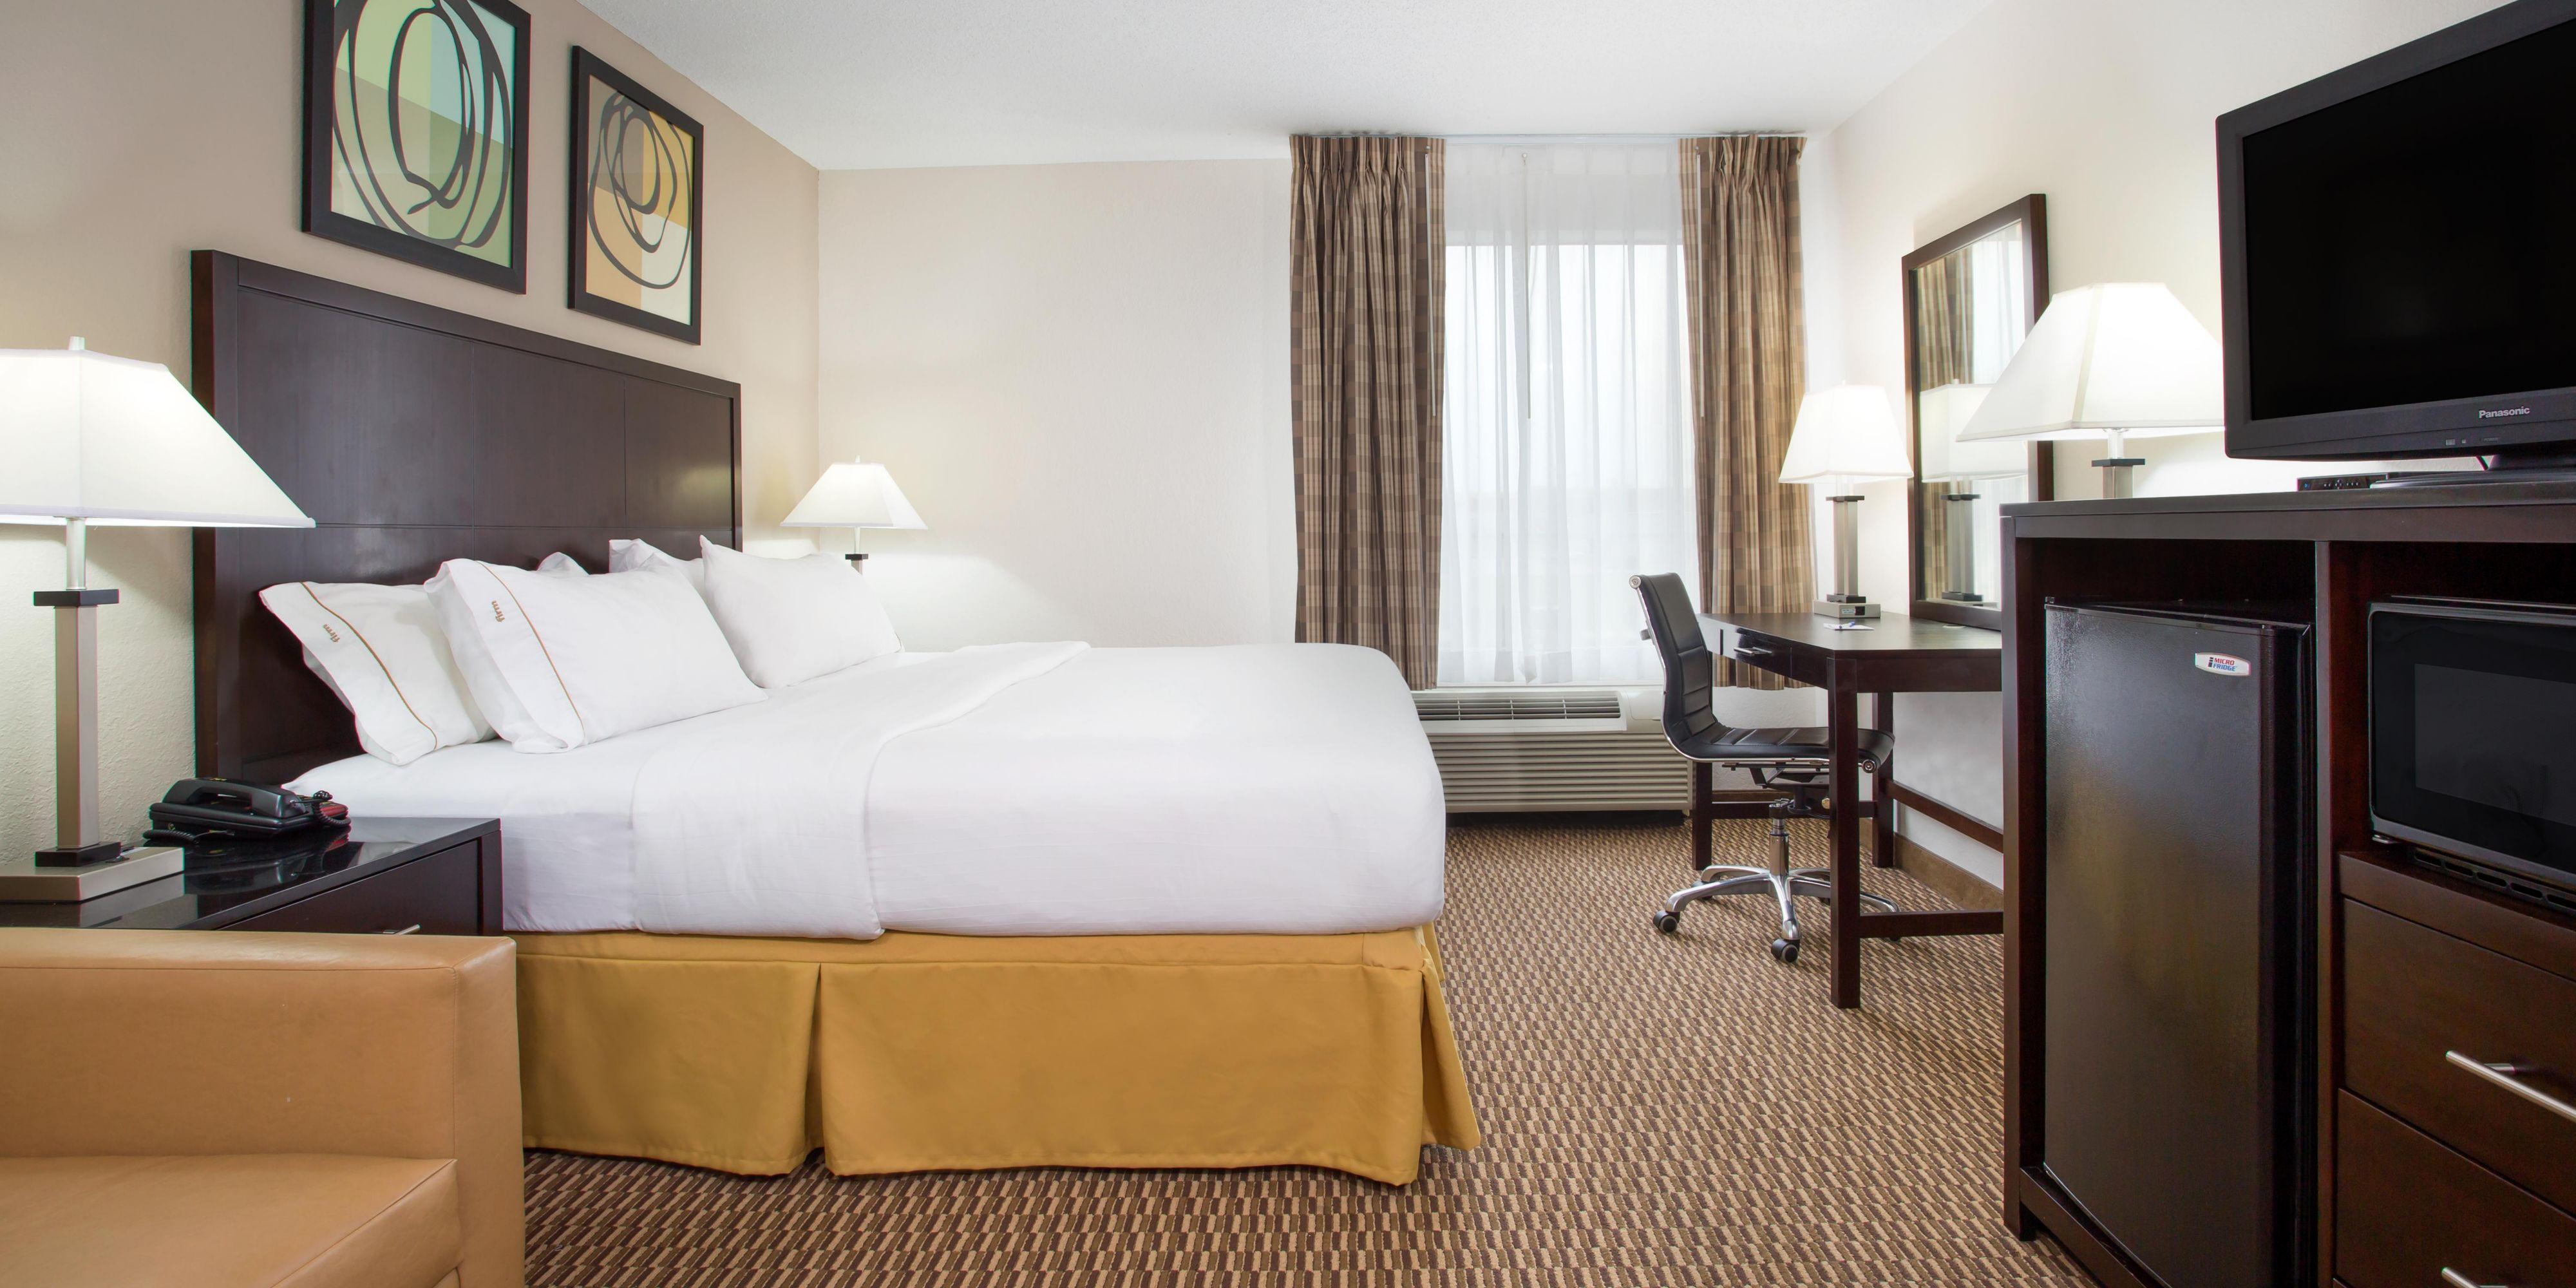 Holiday Inn Express Nicholasville 4030224415 2x1